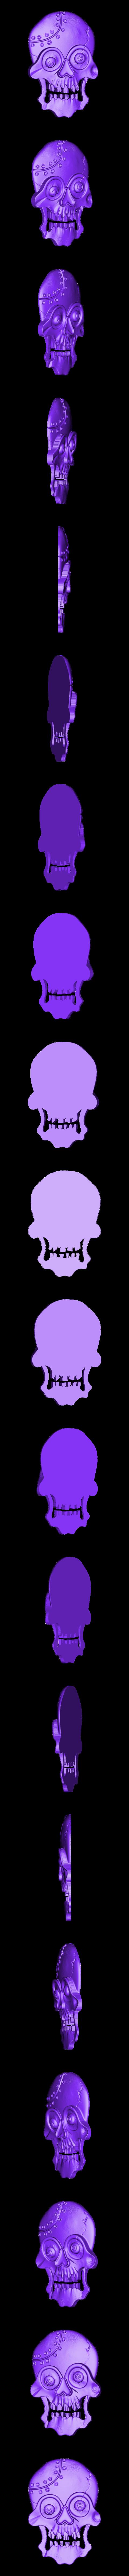 P31 3dprinter.stl Download STL file skull • 3D print object, 3dmodelsByVadim